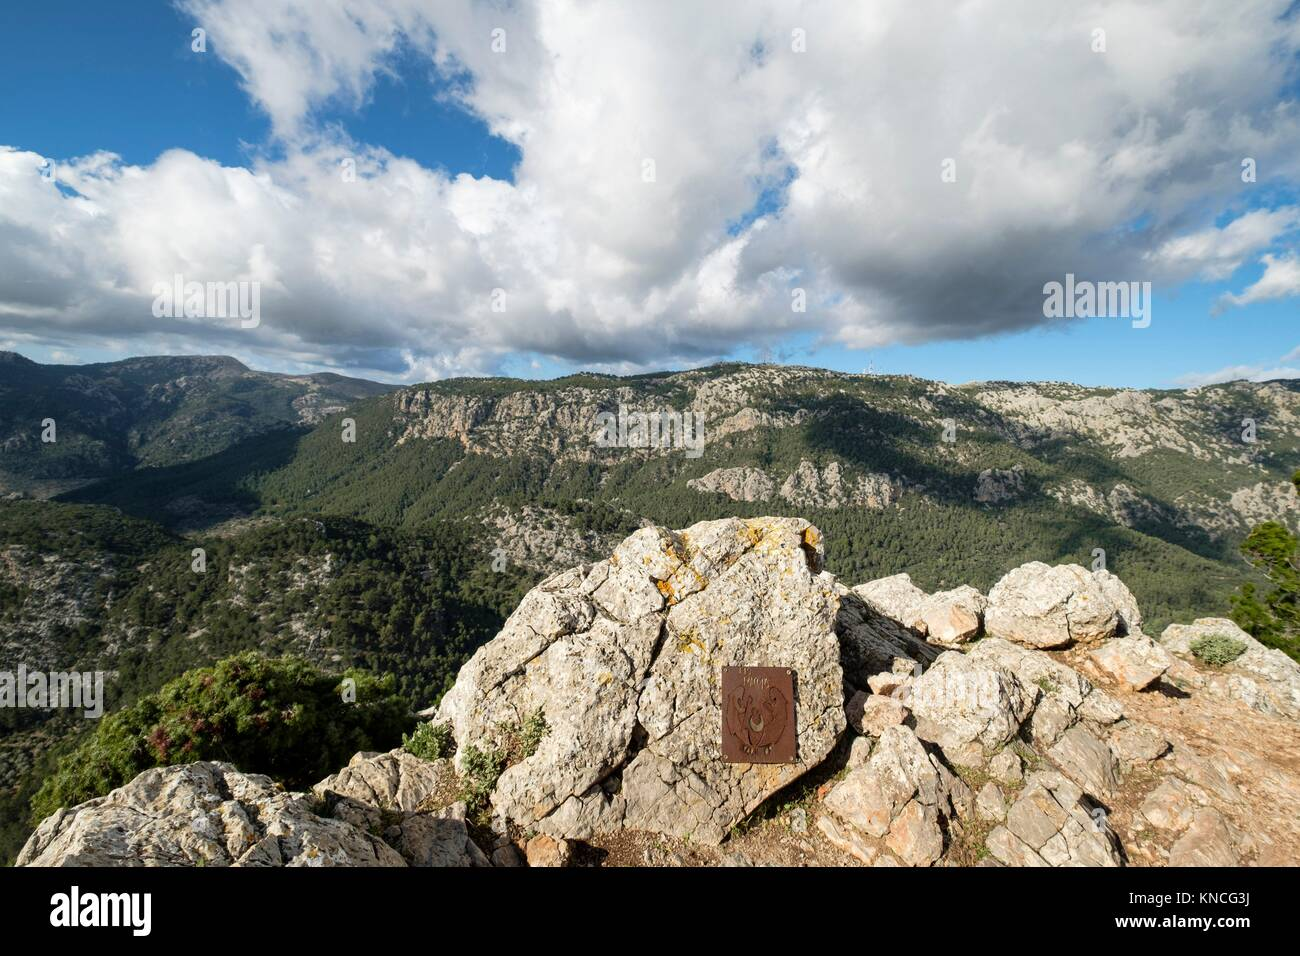 Penyal d Honor, 808 meters, Comuna de Bunyola, communal land, Bunyola, Mallorca, balearic islands, spain, europe. - Stock Image